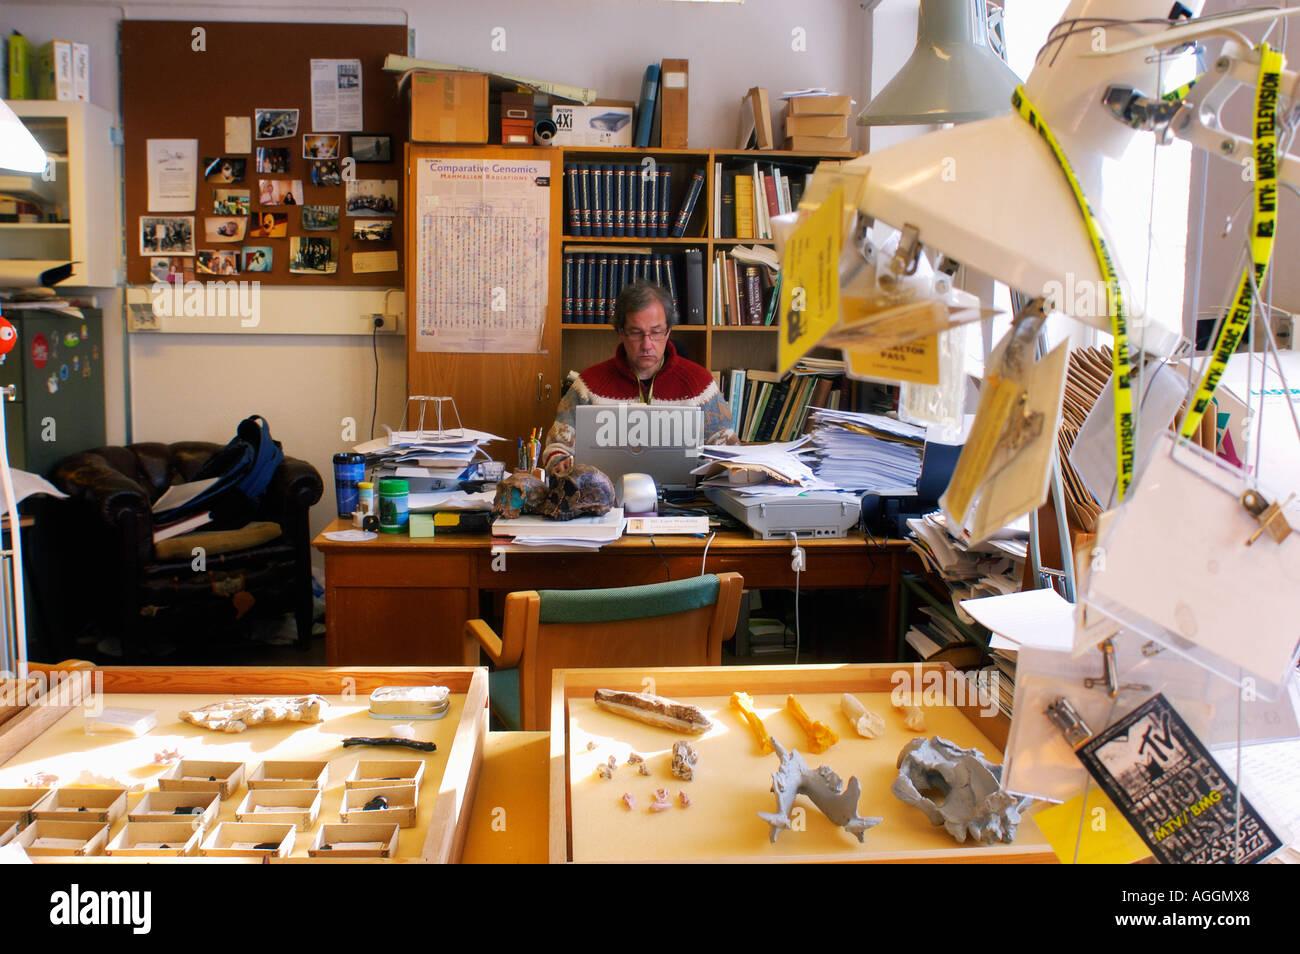 Professor of anthropology with sculls and bones of prehistoric primates (Homo Habilis and Homo Erectus) - Stock Image